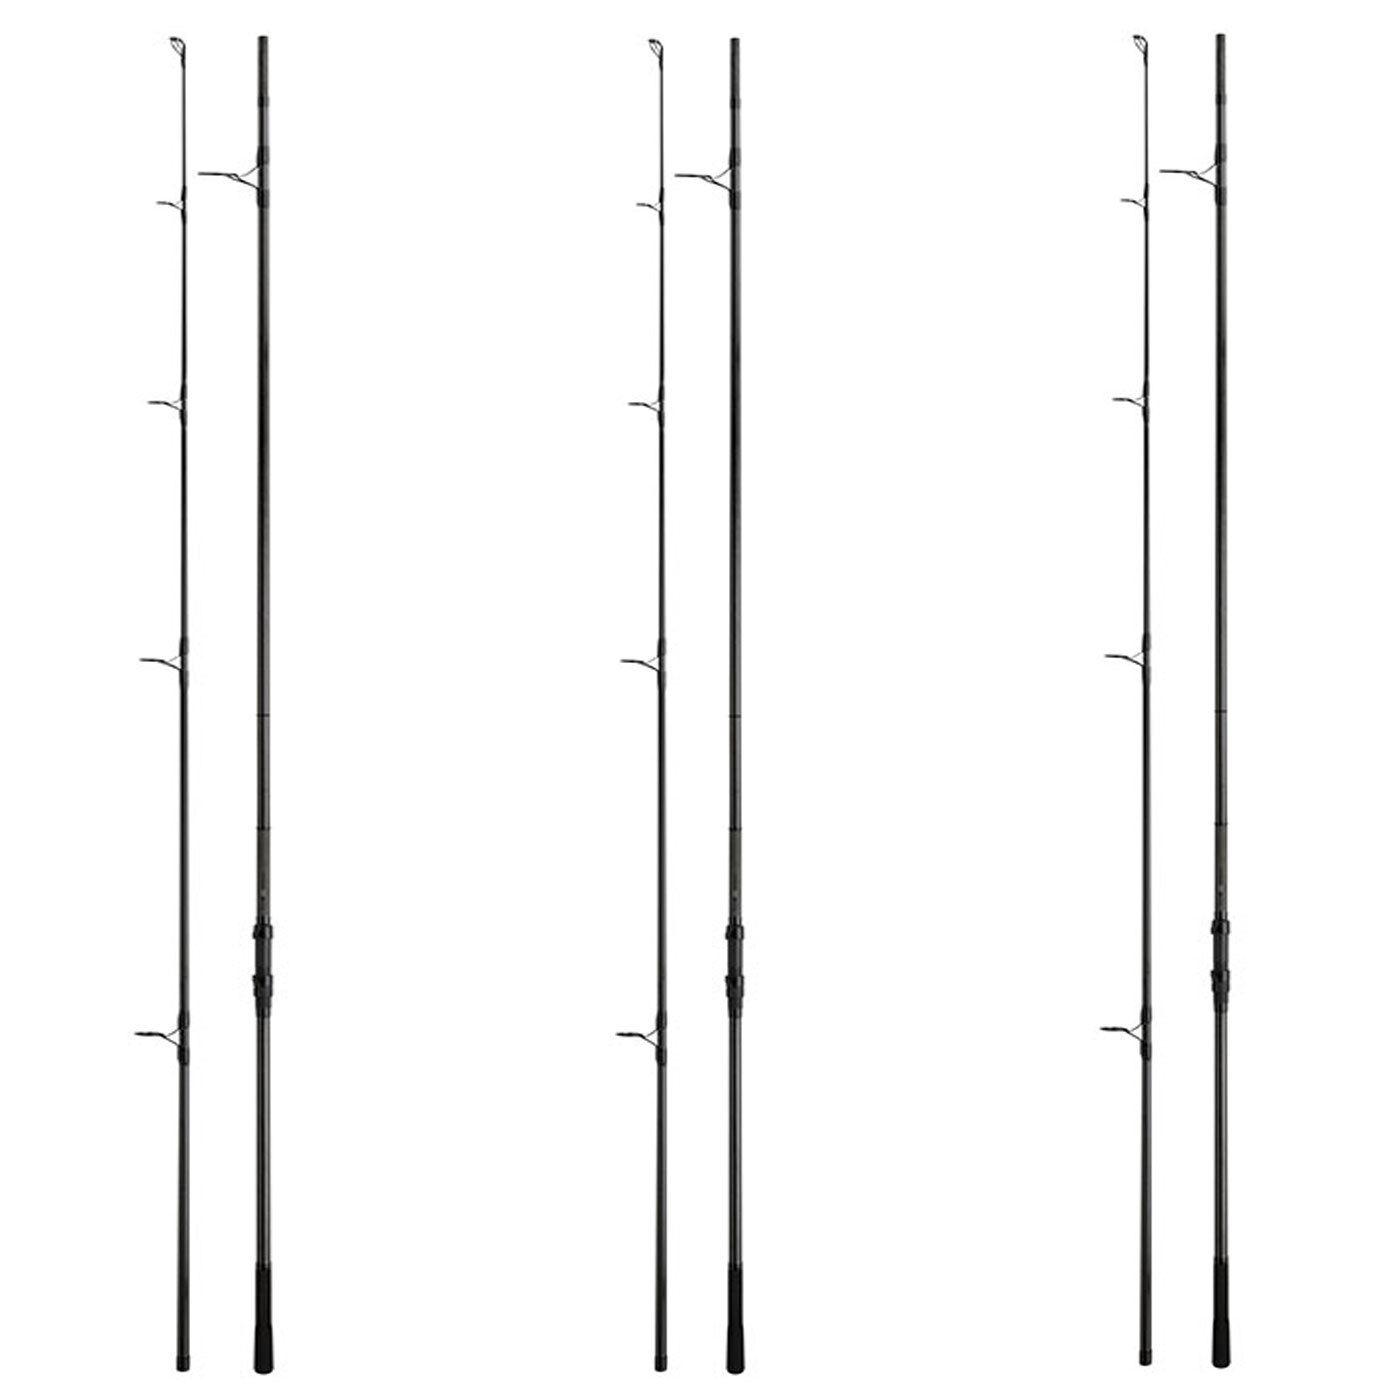 Fox Horizon X3 Carp Rods x 3 - 12ft 3lb T.C - 50mm Ring - Abbreviated Handle.